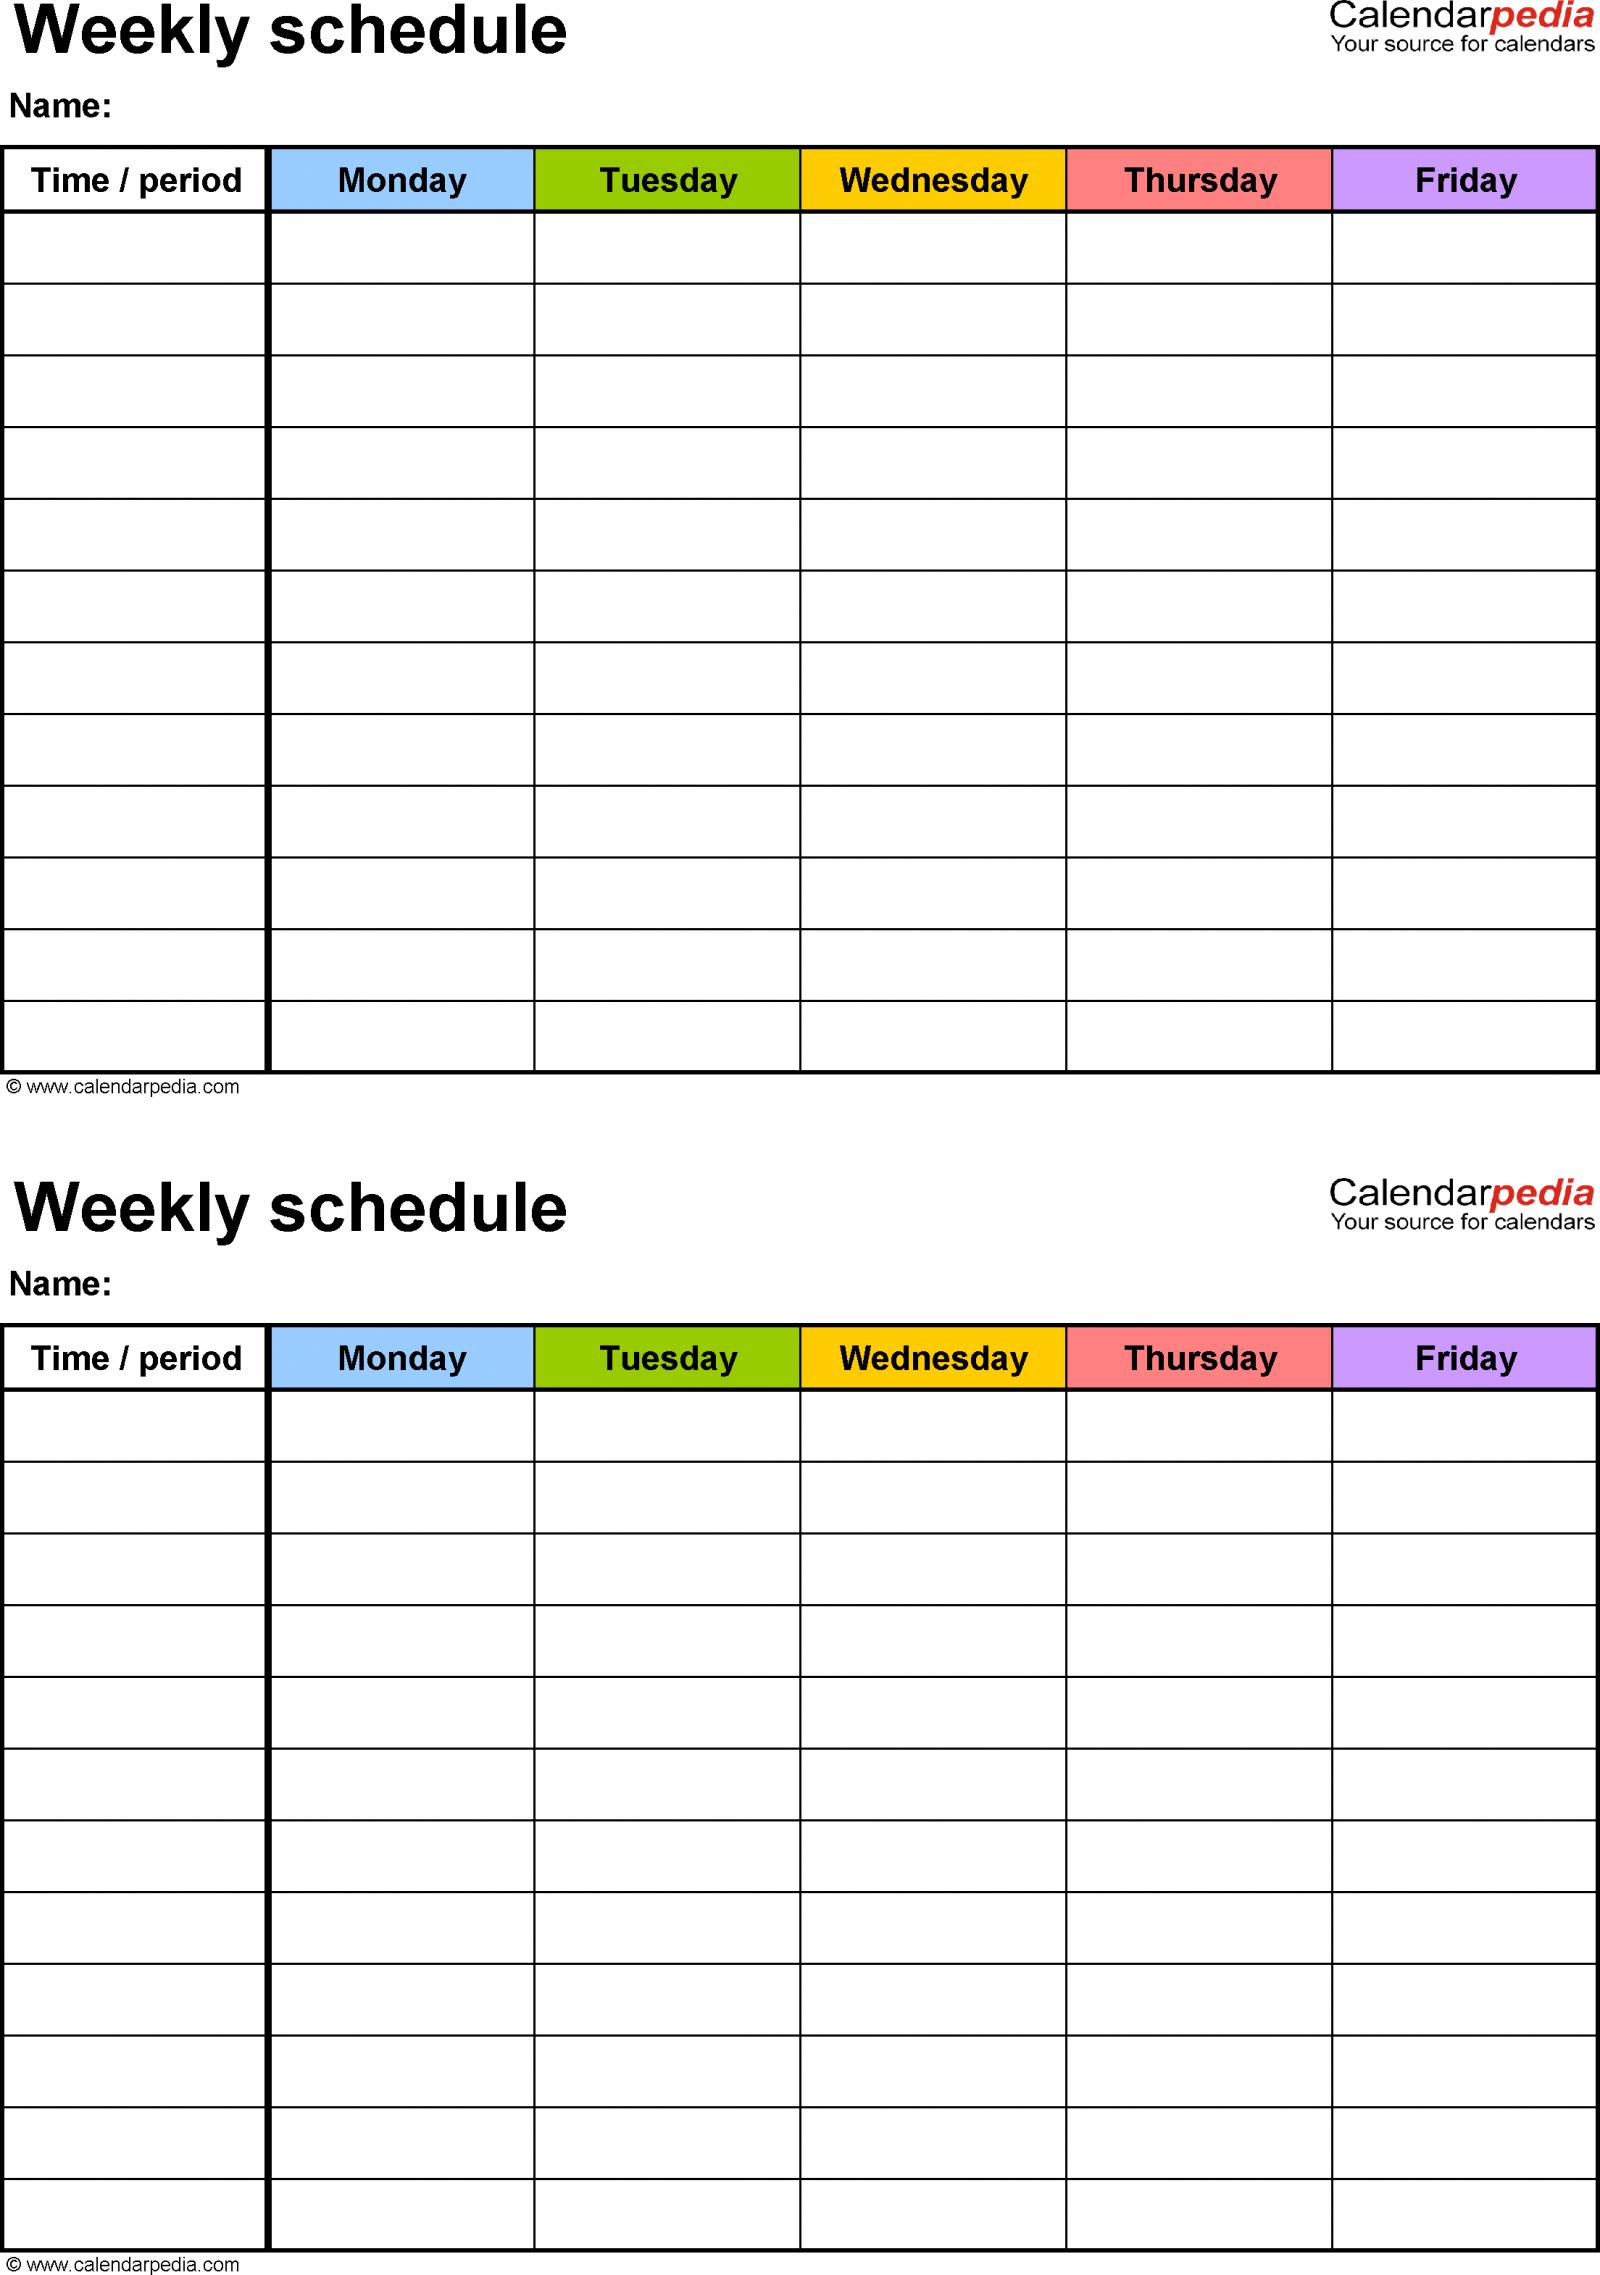 Free Online Spreadsheet Calculator Pertaining To Example Of Free Online Spreadsheet Calculator Newmartin3 Google